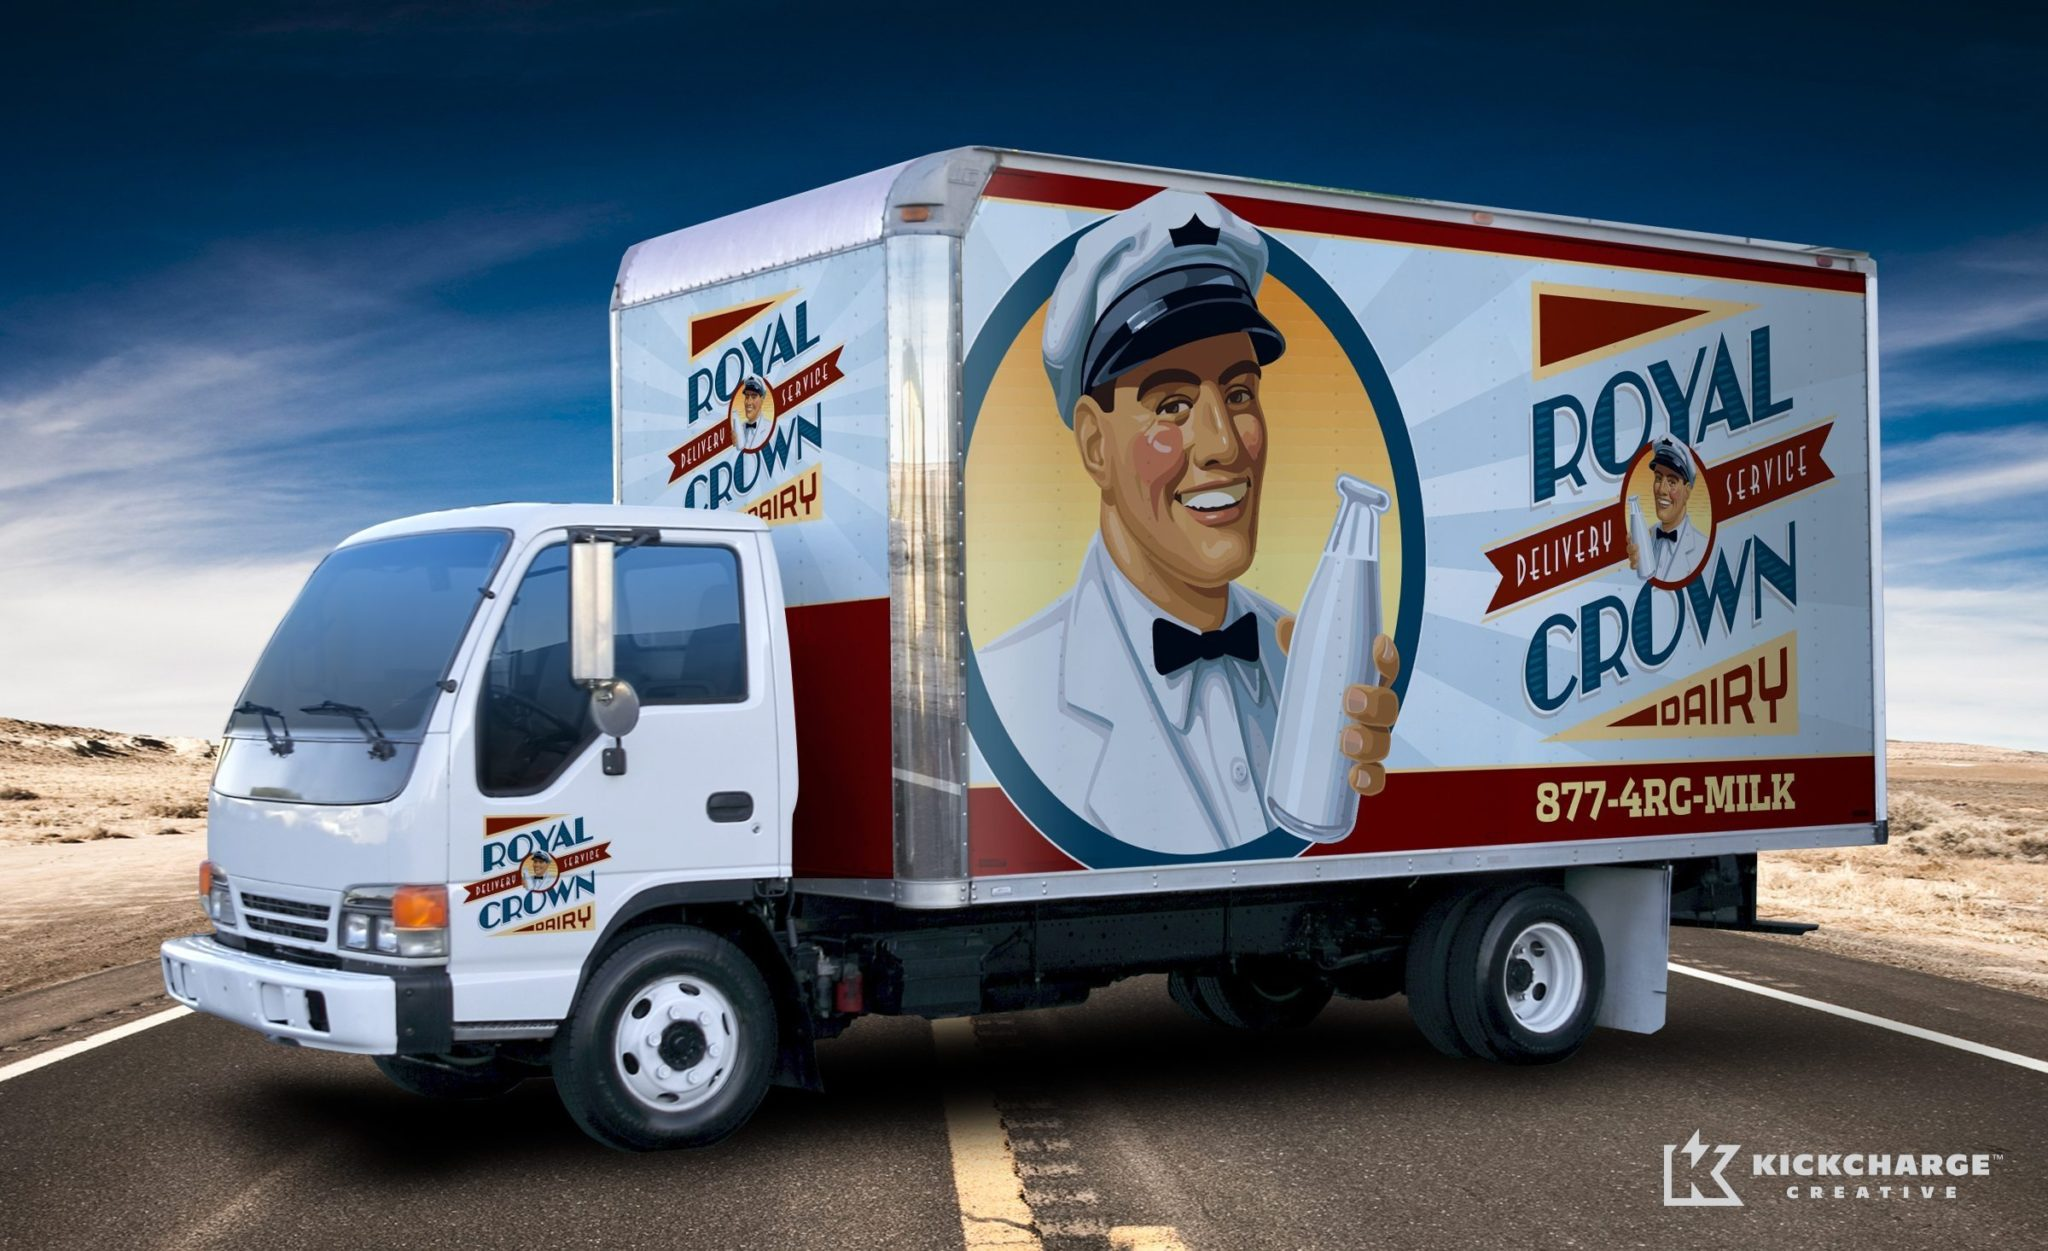 Retro truck wrap design for a milk delivery service in Parsippany, NJ.